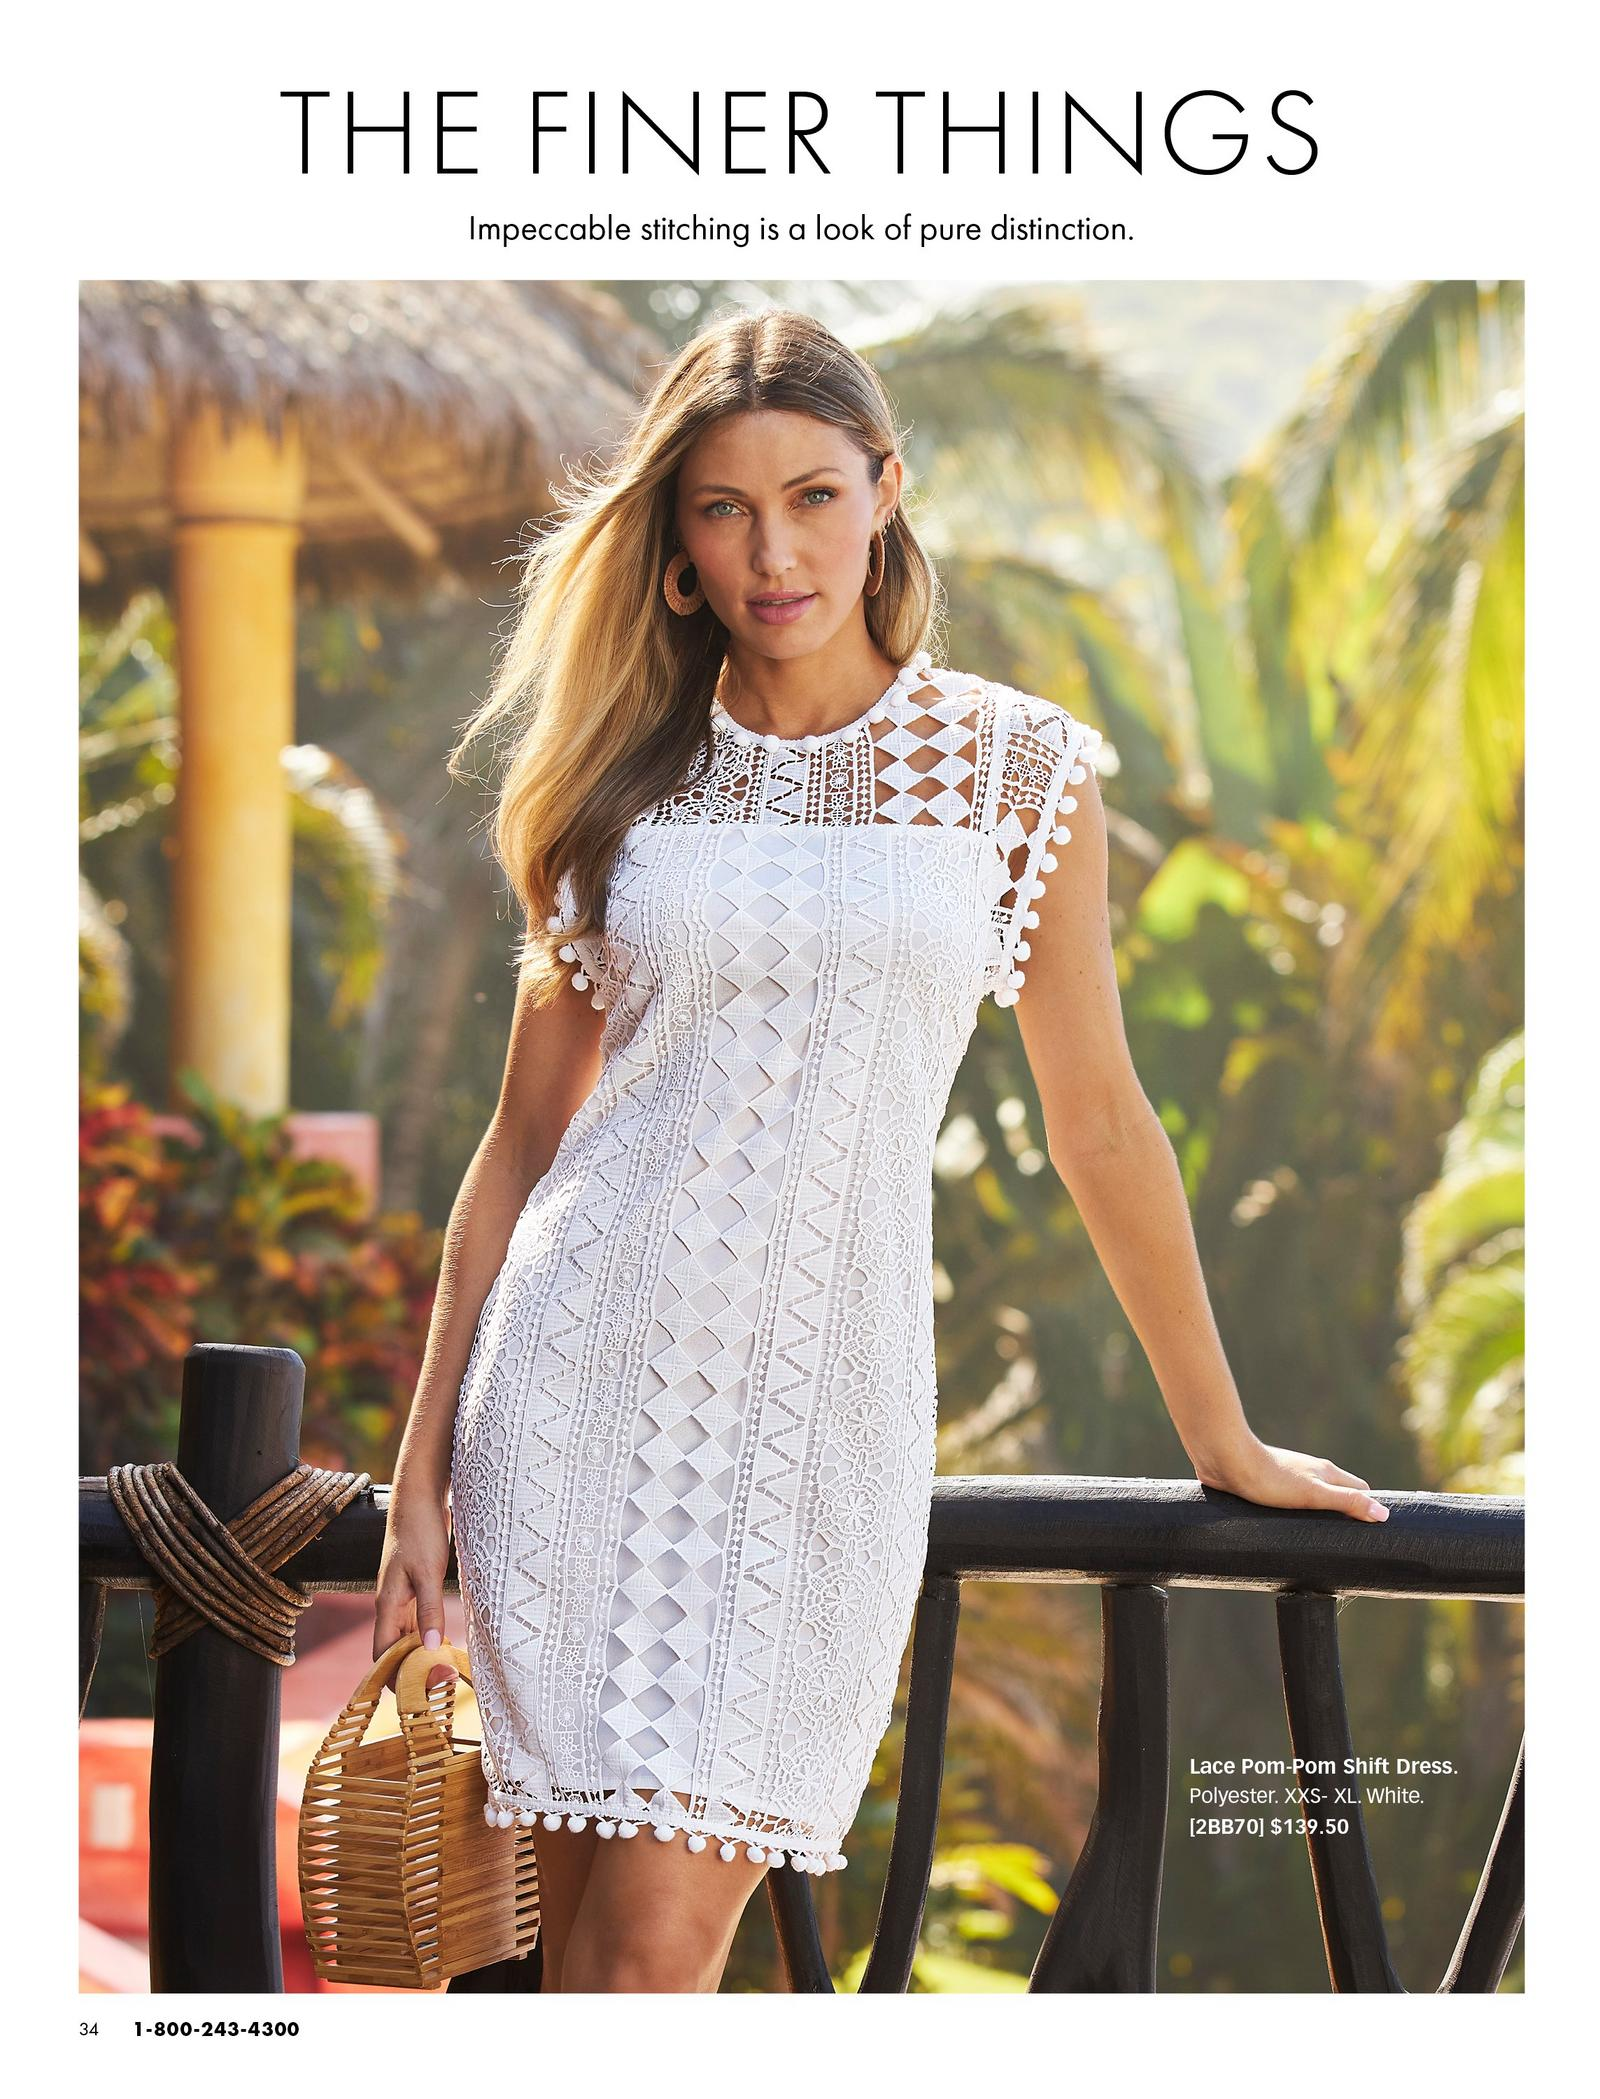 model wearing a white lace pom-pom shift dress.